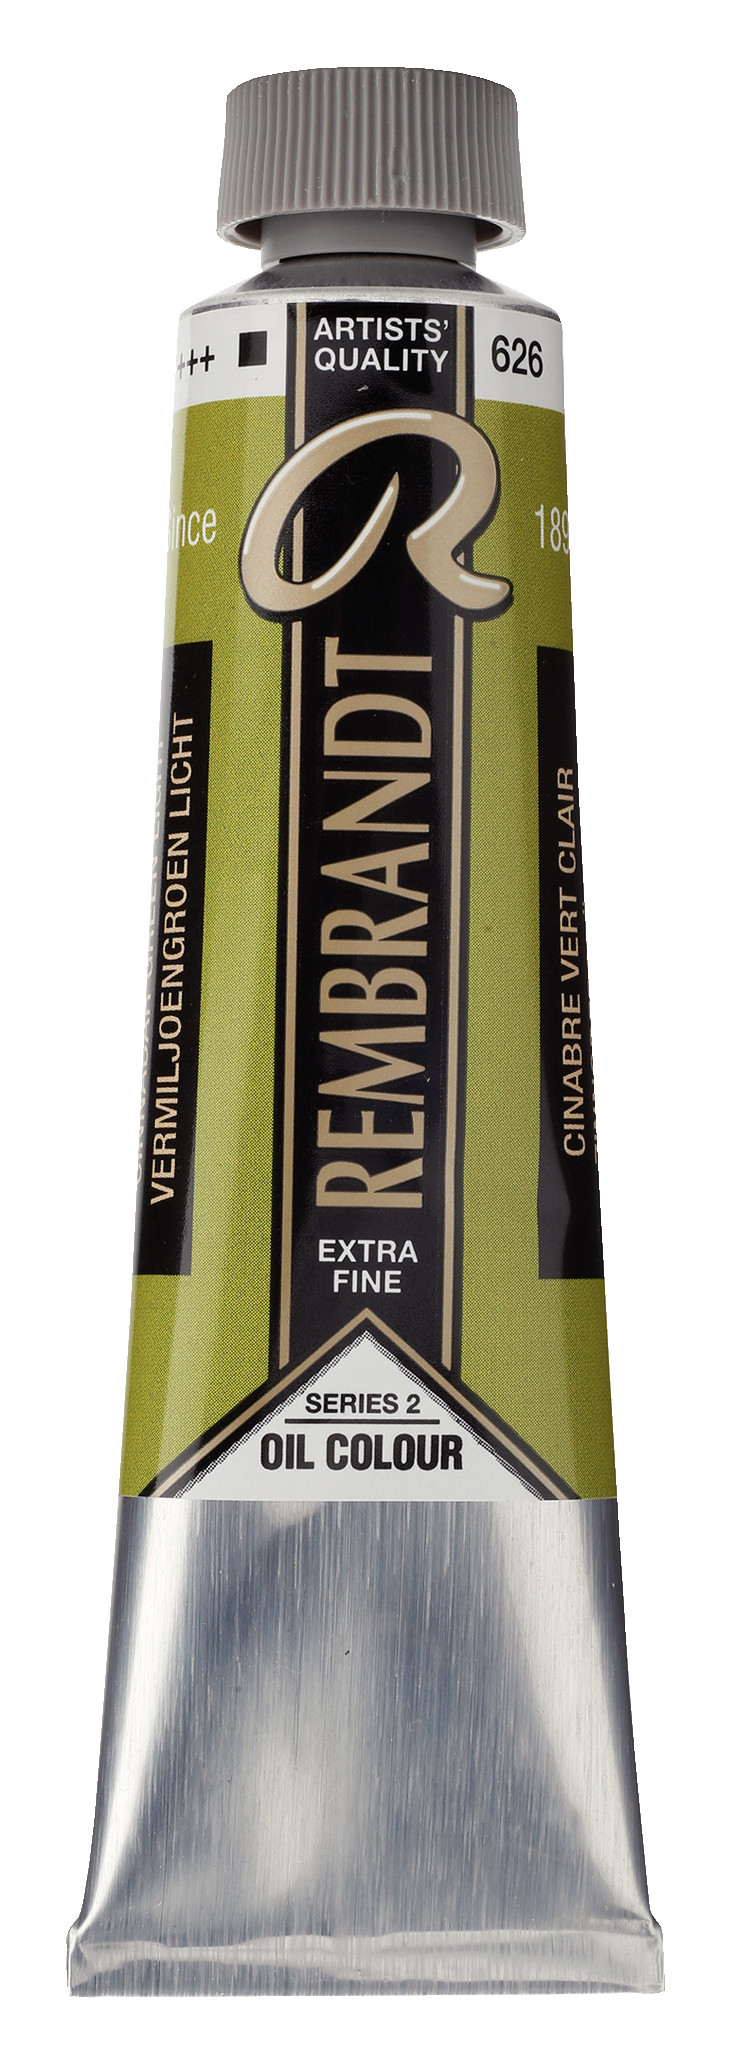 Rembrandt Oil colour Paint Cinnabar Green Light (626) 40ml Tube